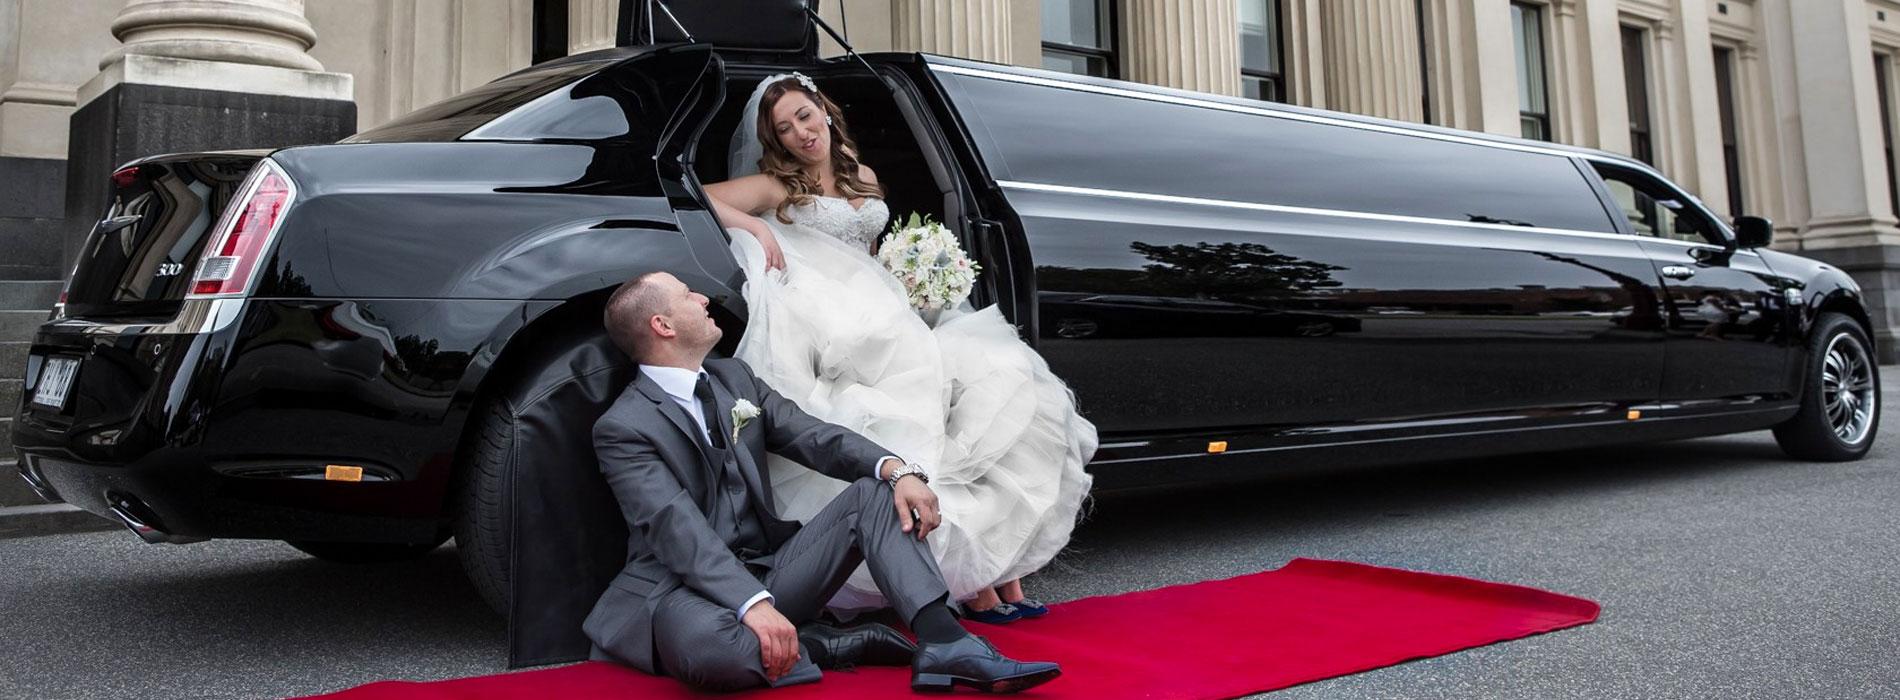 Wedding Limousines Las Vegas